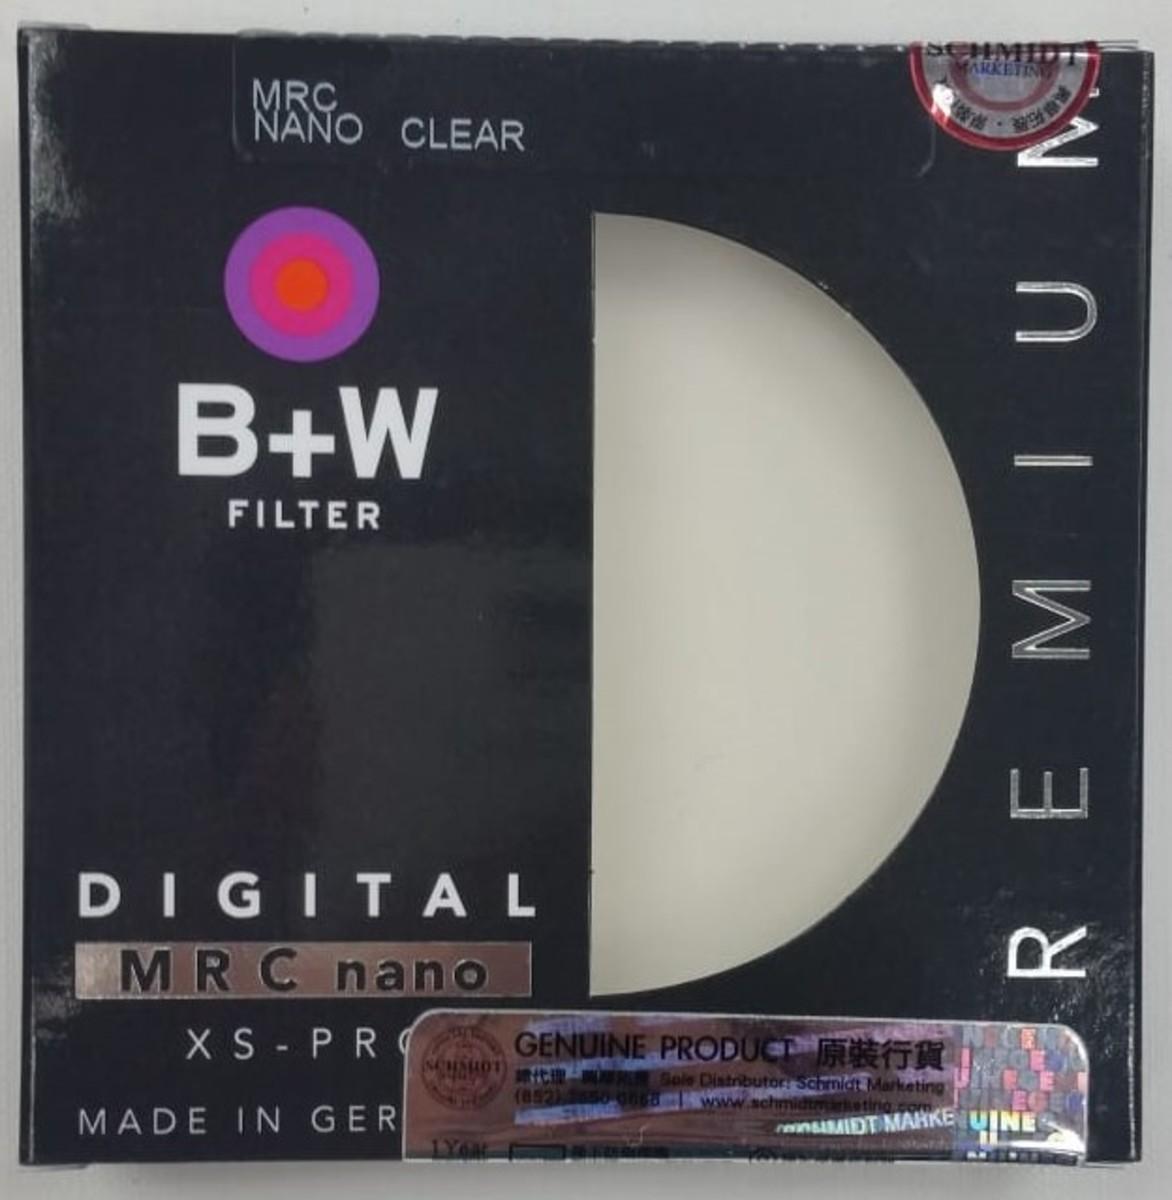 55mm XS-Pro Digital 007 Clear filter MRC nano Protector頂級保護鏡